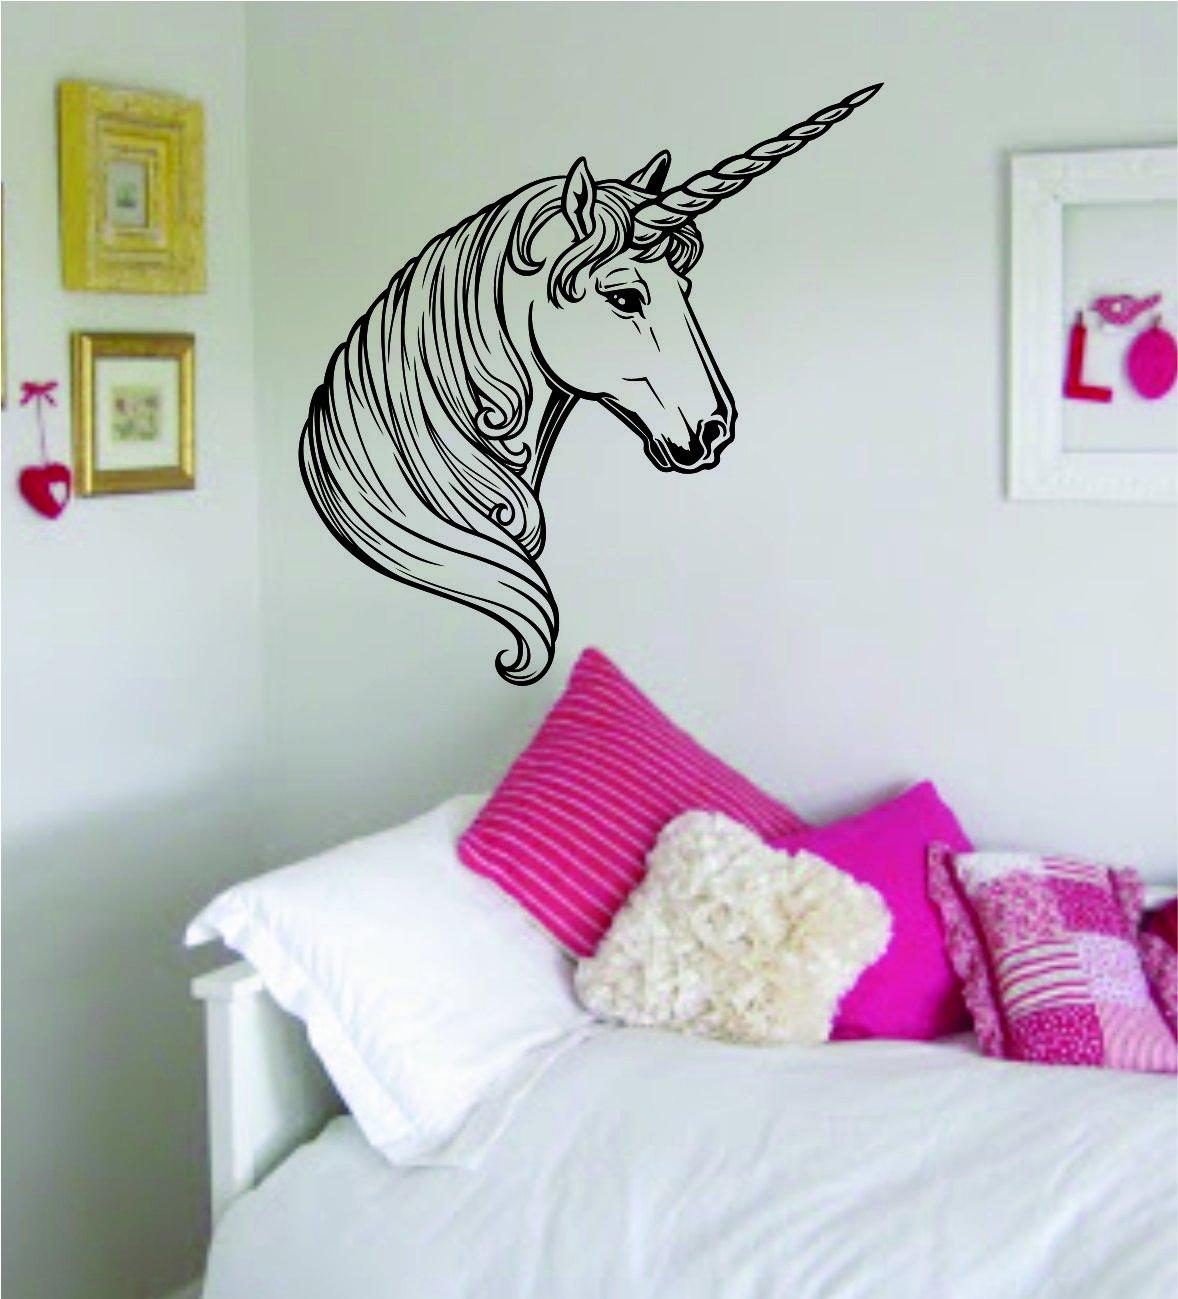 amazon com unicorn decal sticker wall vinyl art animal teen girl amazon com unicorn decal sticker wall vinyl art animal teen girl home kitchen